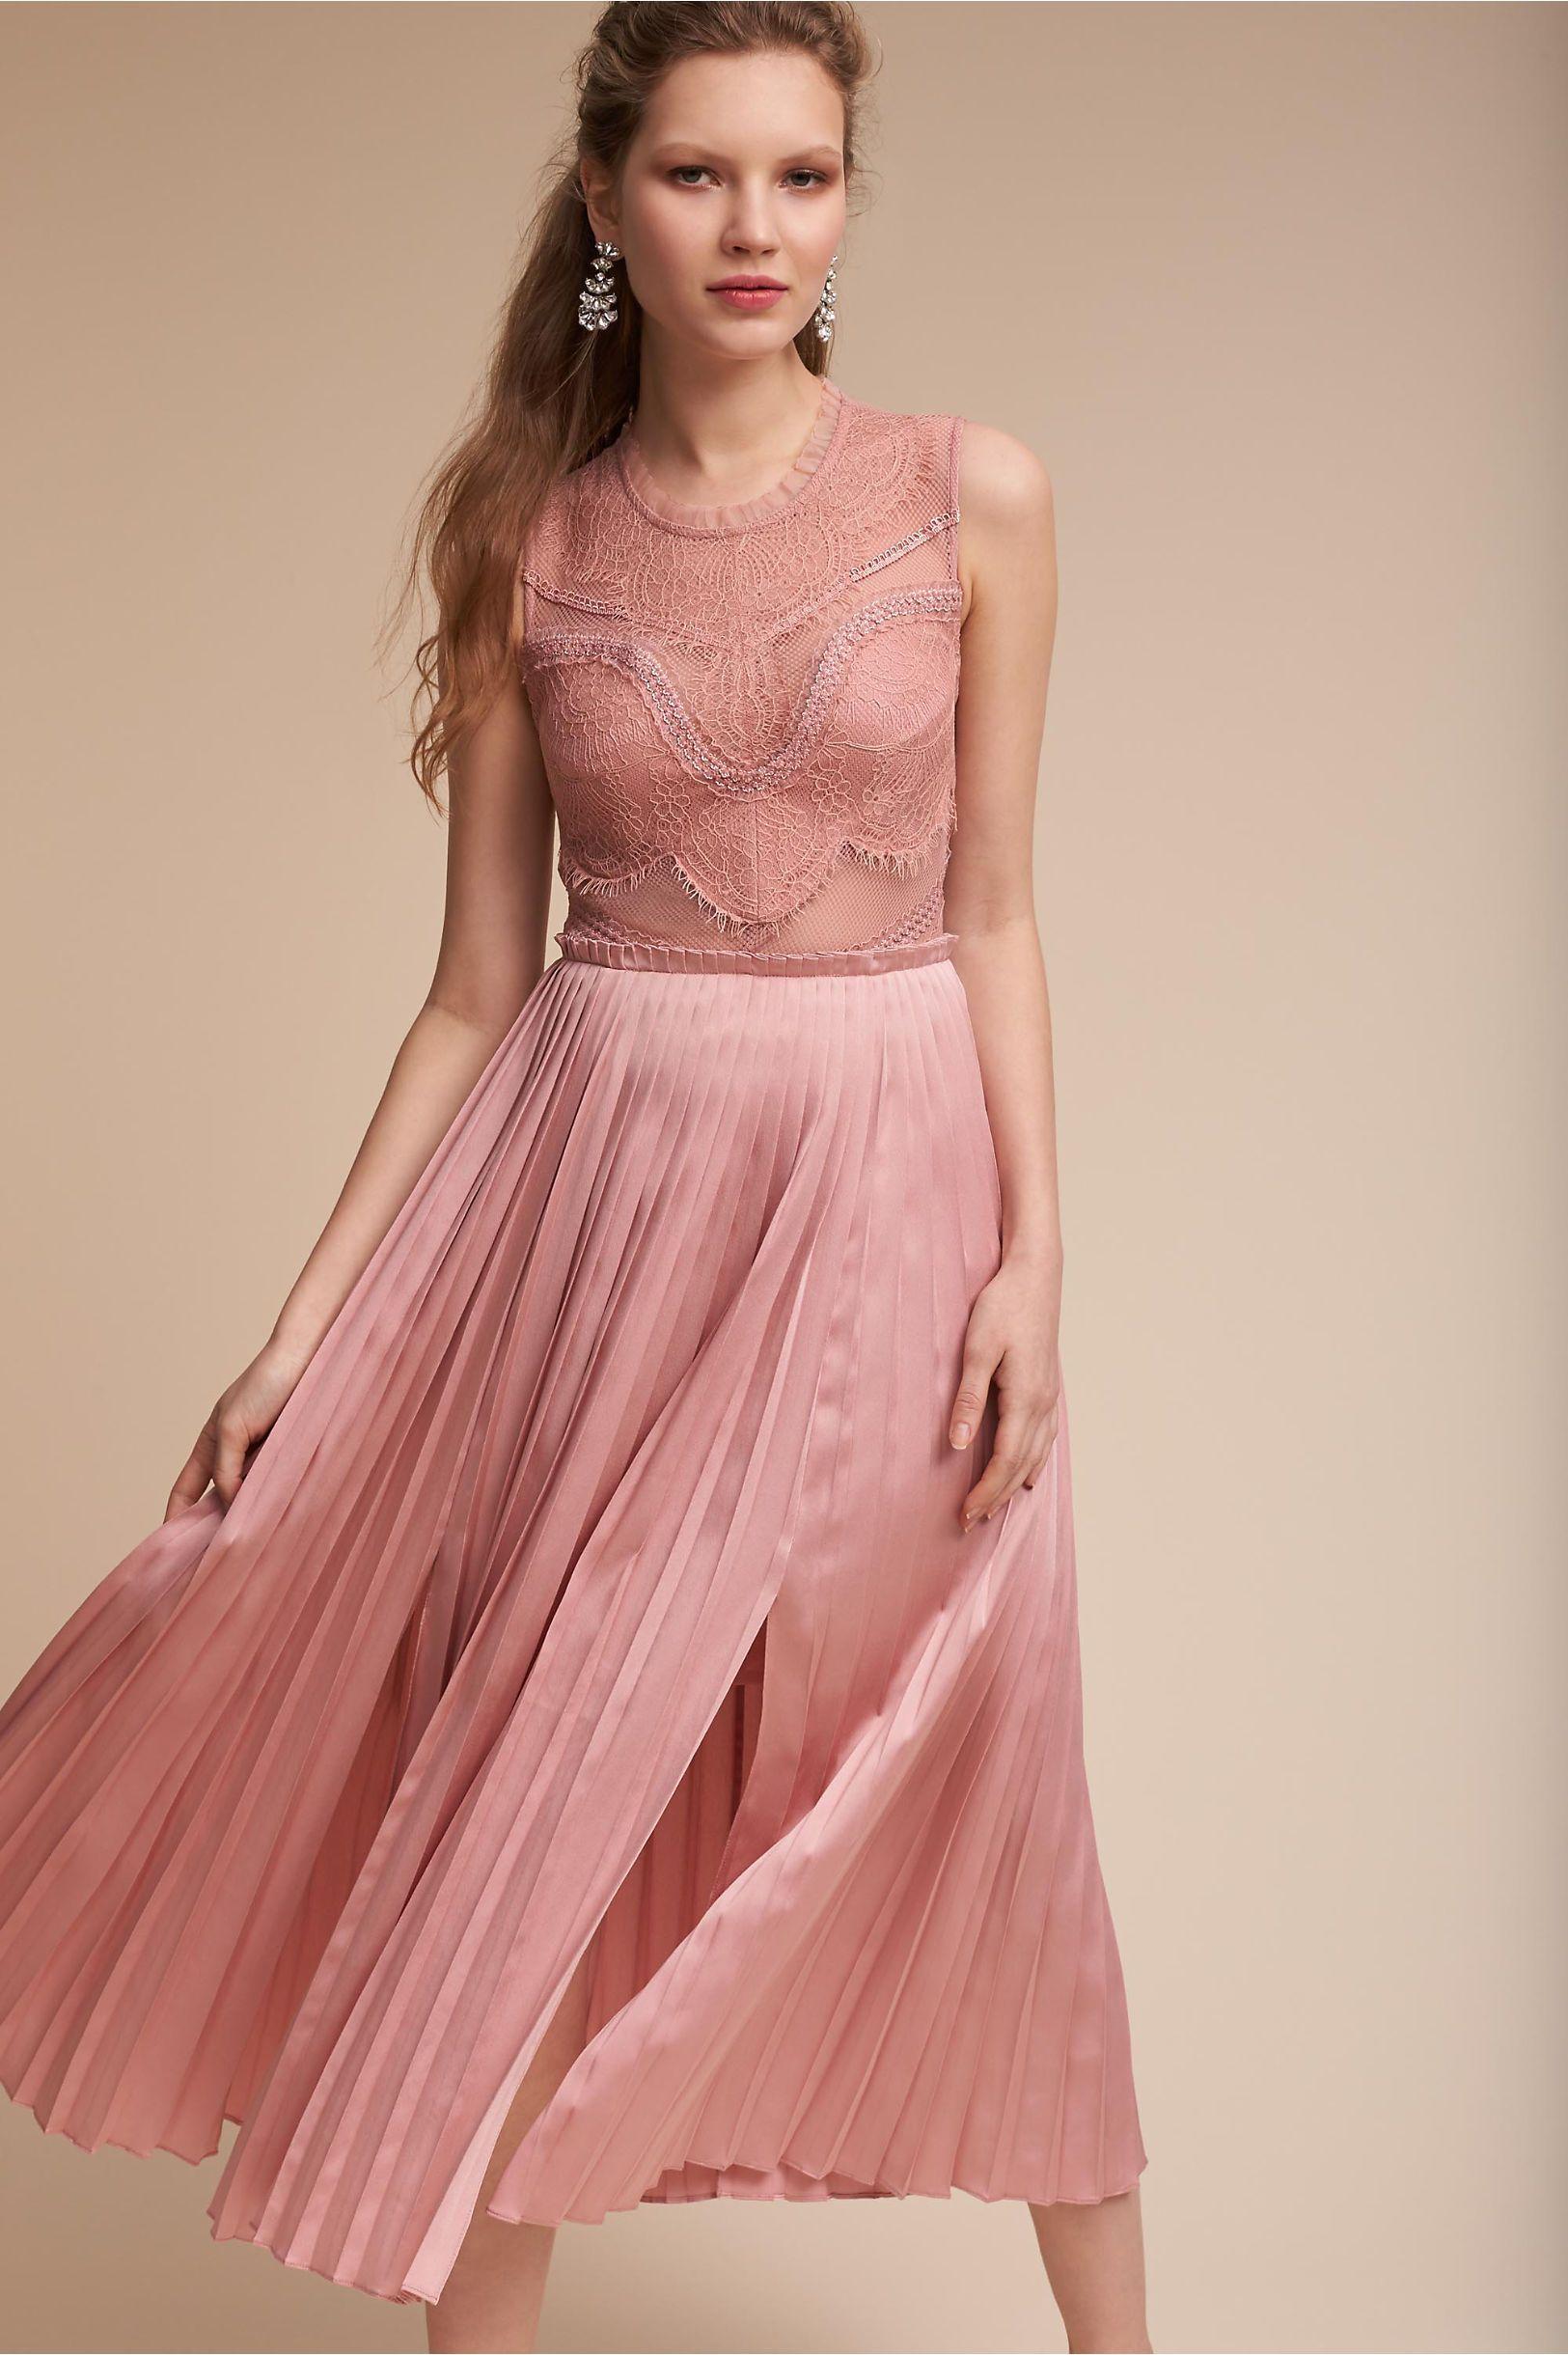 Bhldn pop of peony dress in dresses view all dresses bhldn